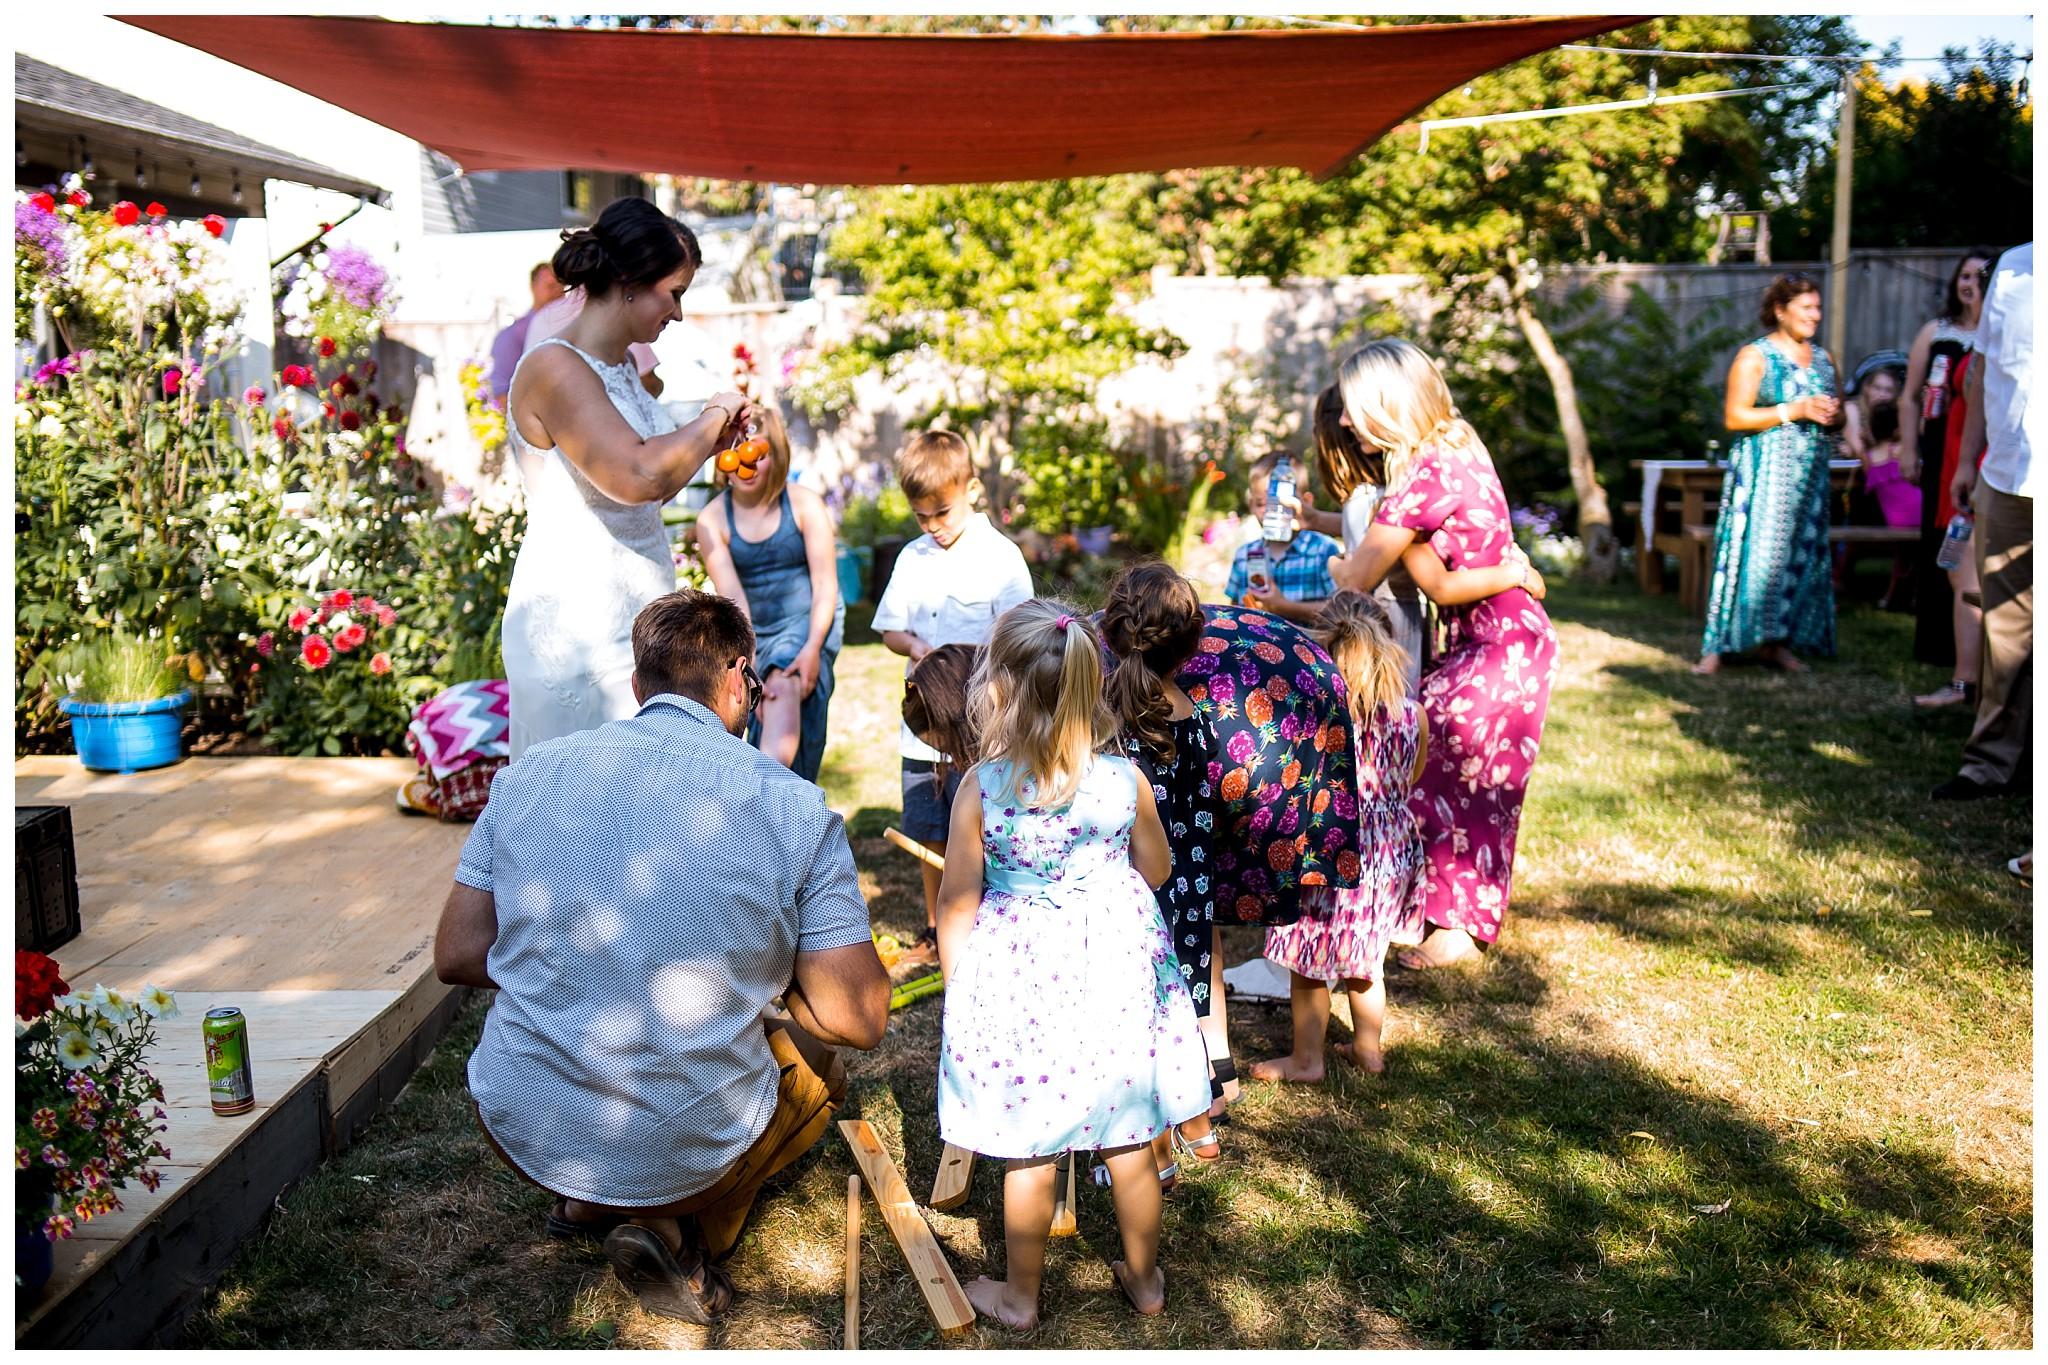 Aldergrove backyard summer wedding photographer bc canada outdoor garden inspiration family couple with kids, bride and groom_0066.jpg